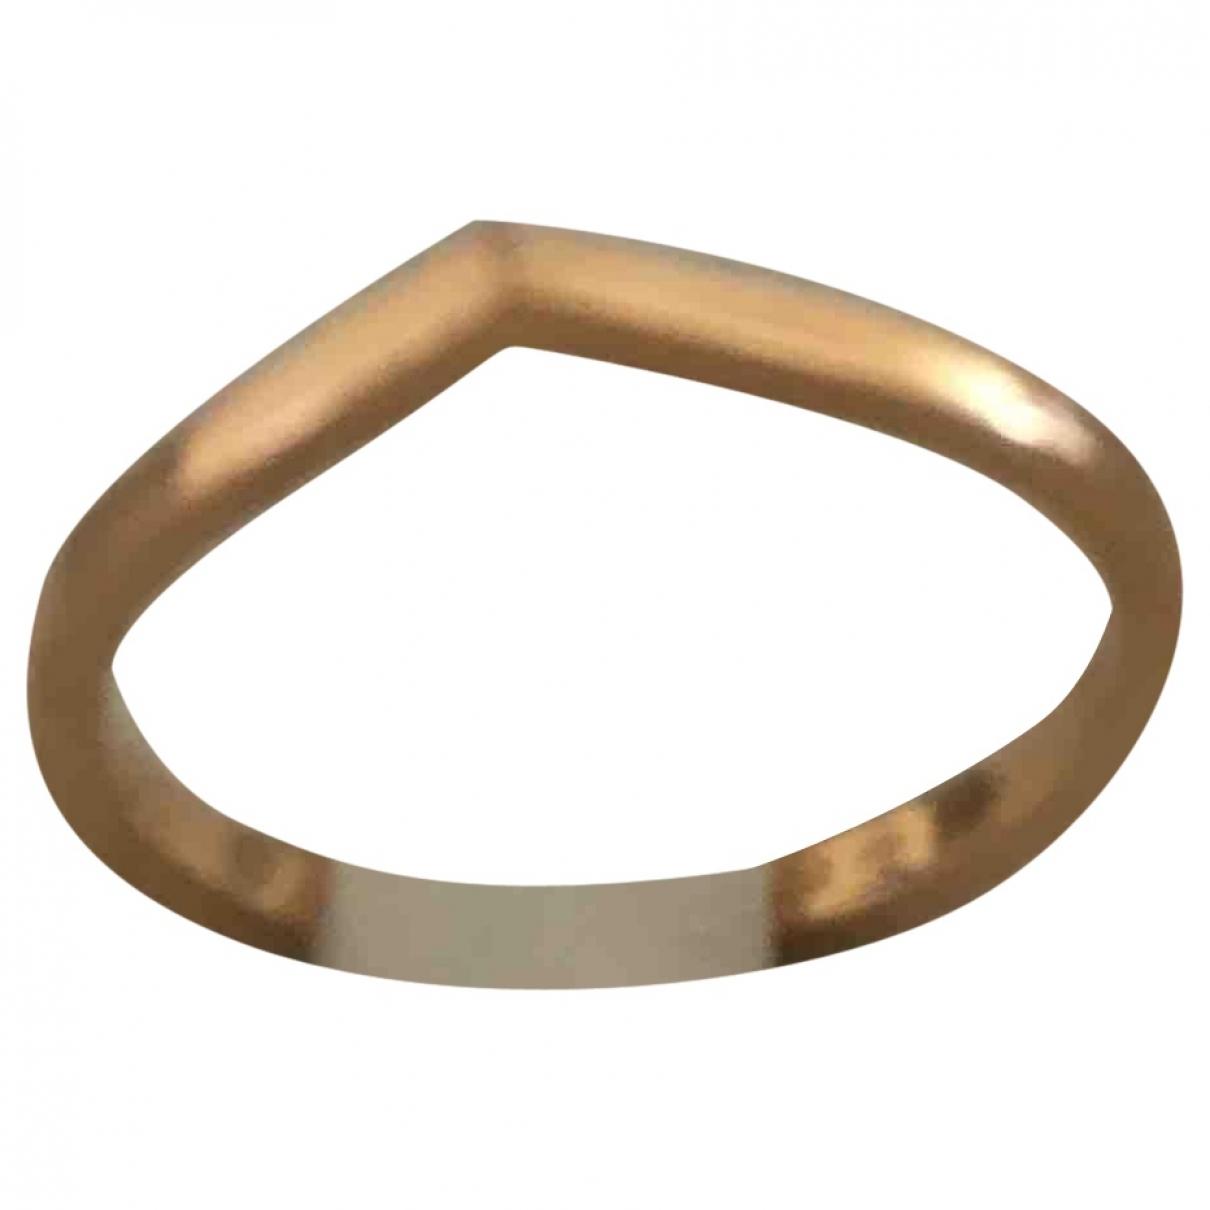 Repossi - Bague Antifer pour femme en or rose - dore